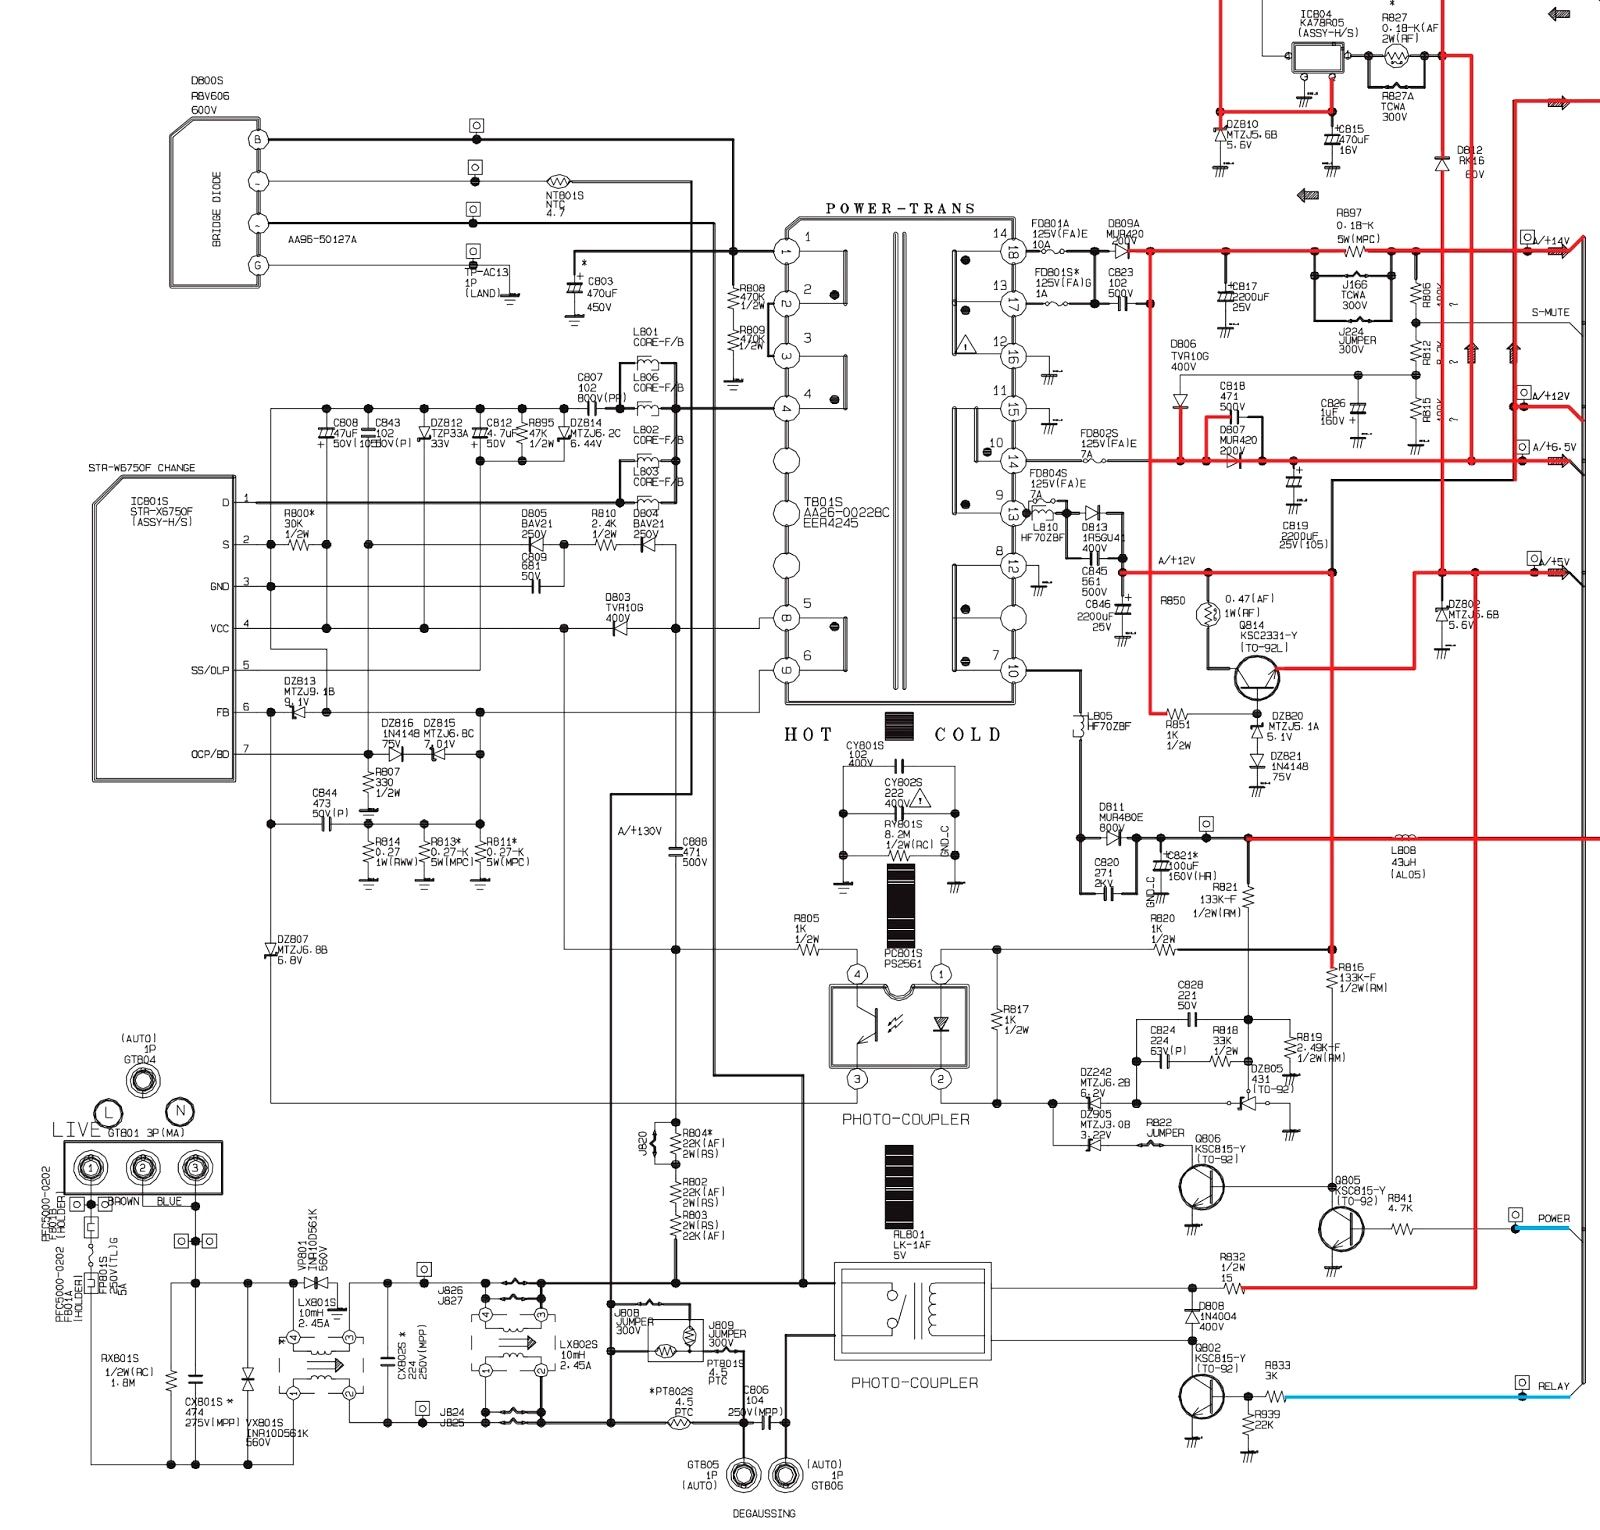 Asco 24vdc Solenoid Valve Wiring Diagram Utility Trailer Basic Electrical Diagrams Library